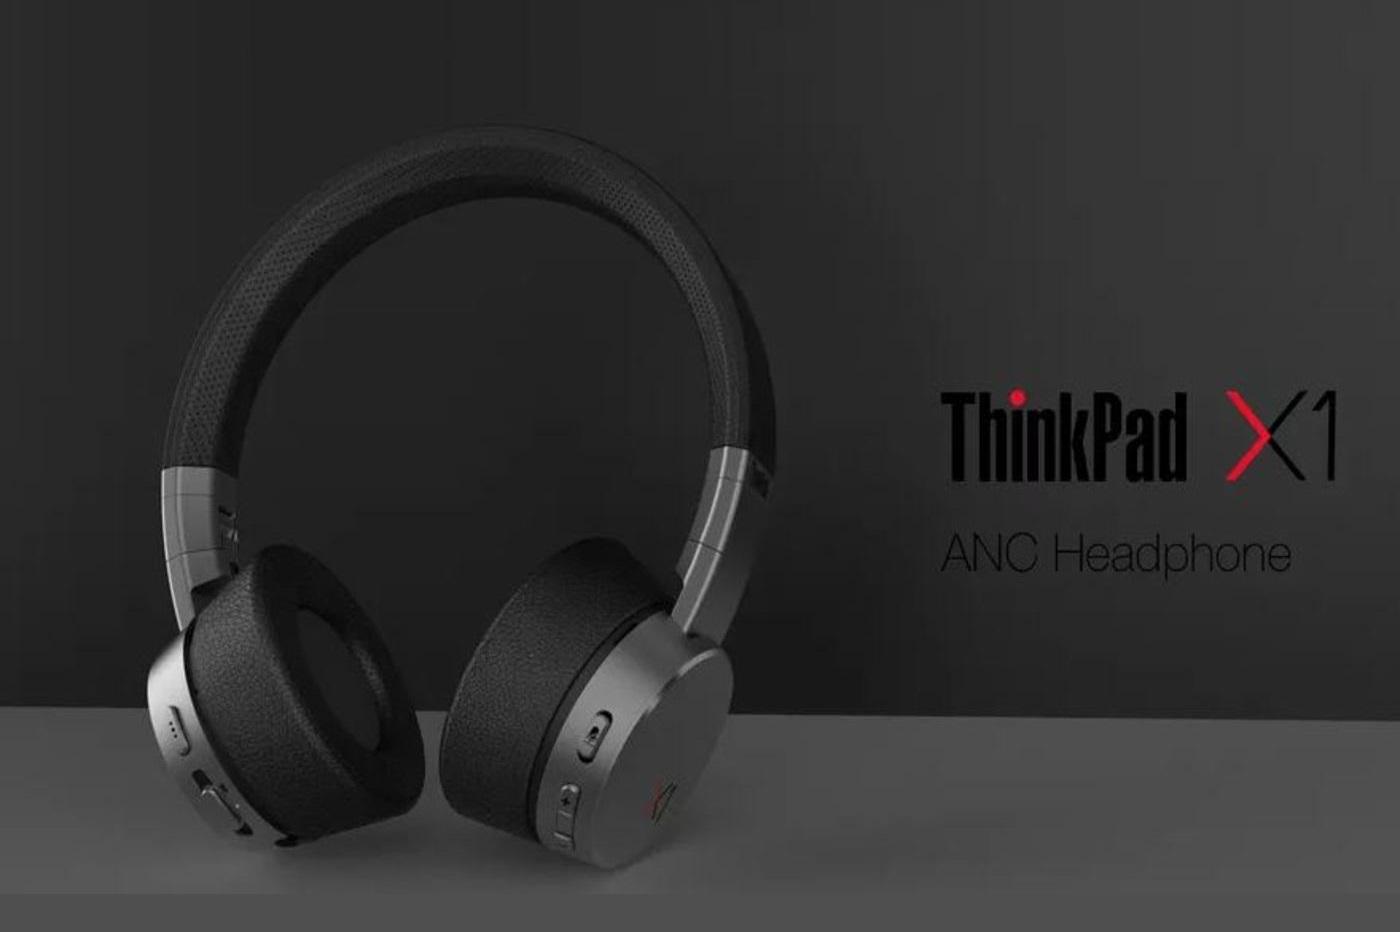 casques antibruit Lenovo ThinkPad X1 ANC